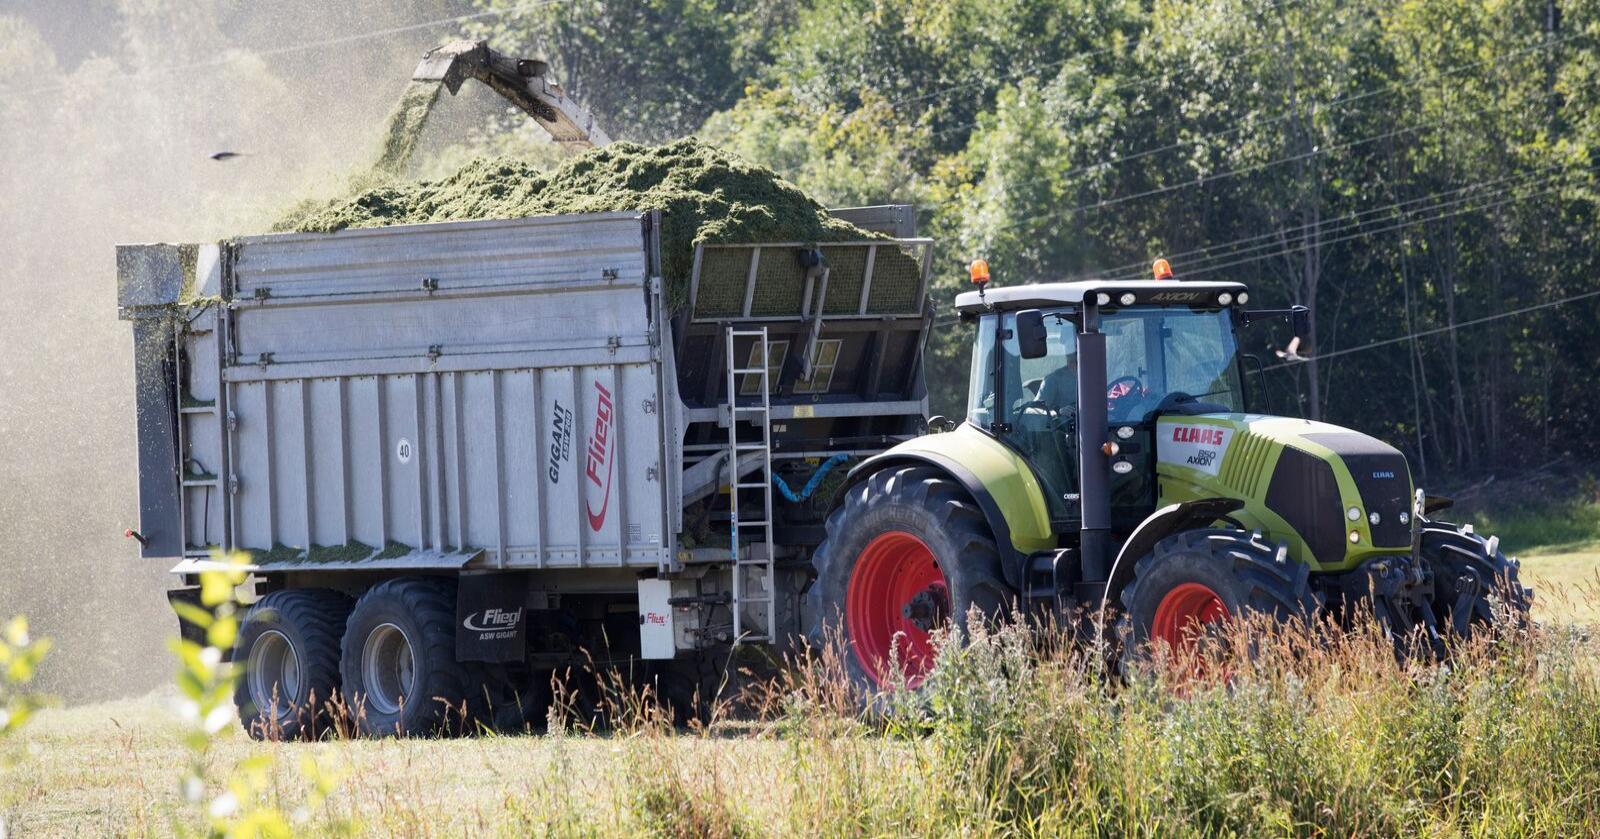 Bøndene på Vestlandet ser mørkare på framtida som jordbrukarar enn bønder i andre delar av landet. Foto: Terje Bendiksby / NTB / NPK